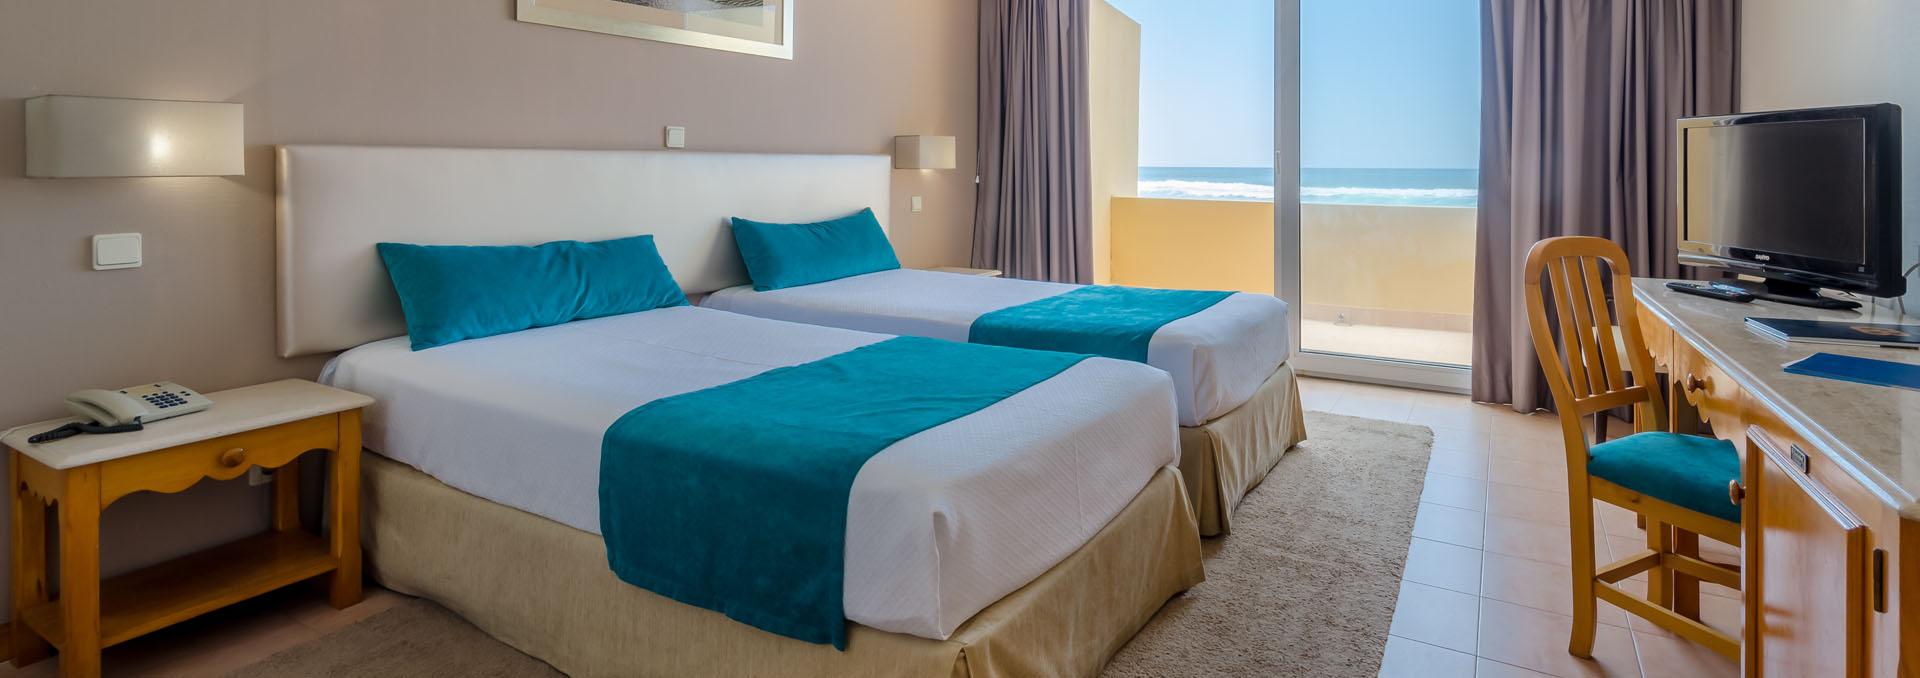 Arribas Sintra Hotel Alojamento / Quarto Standard